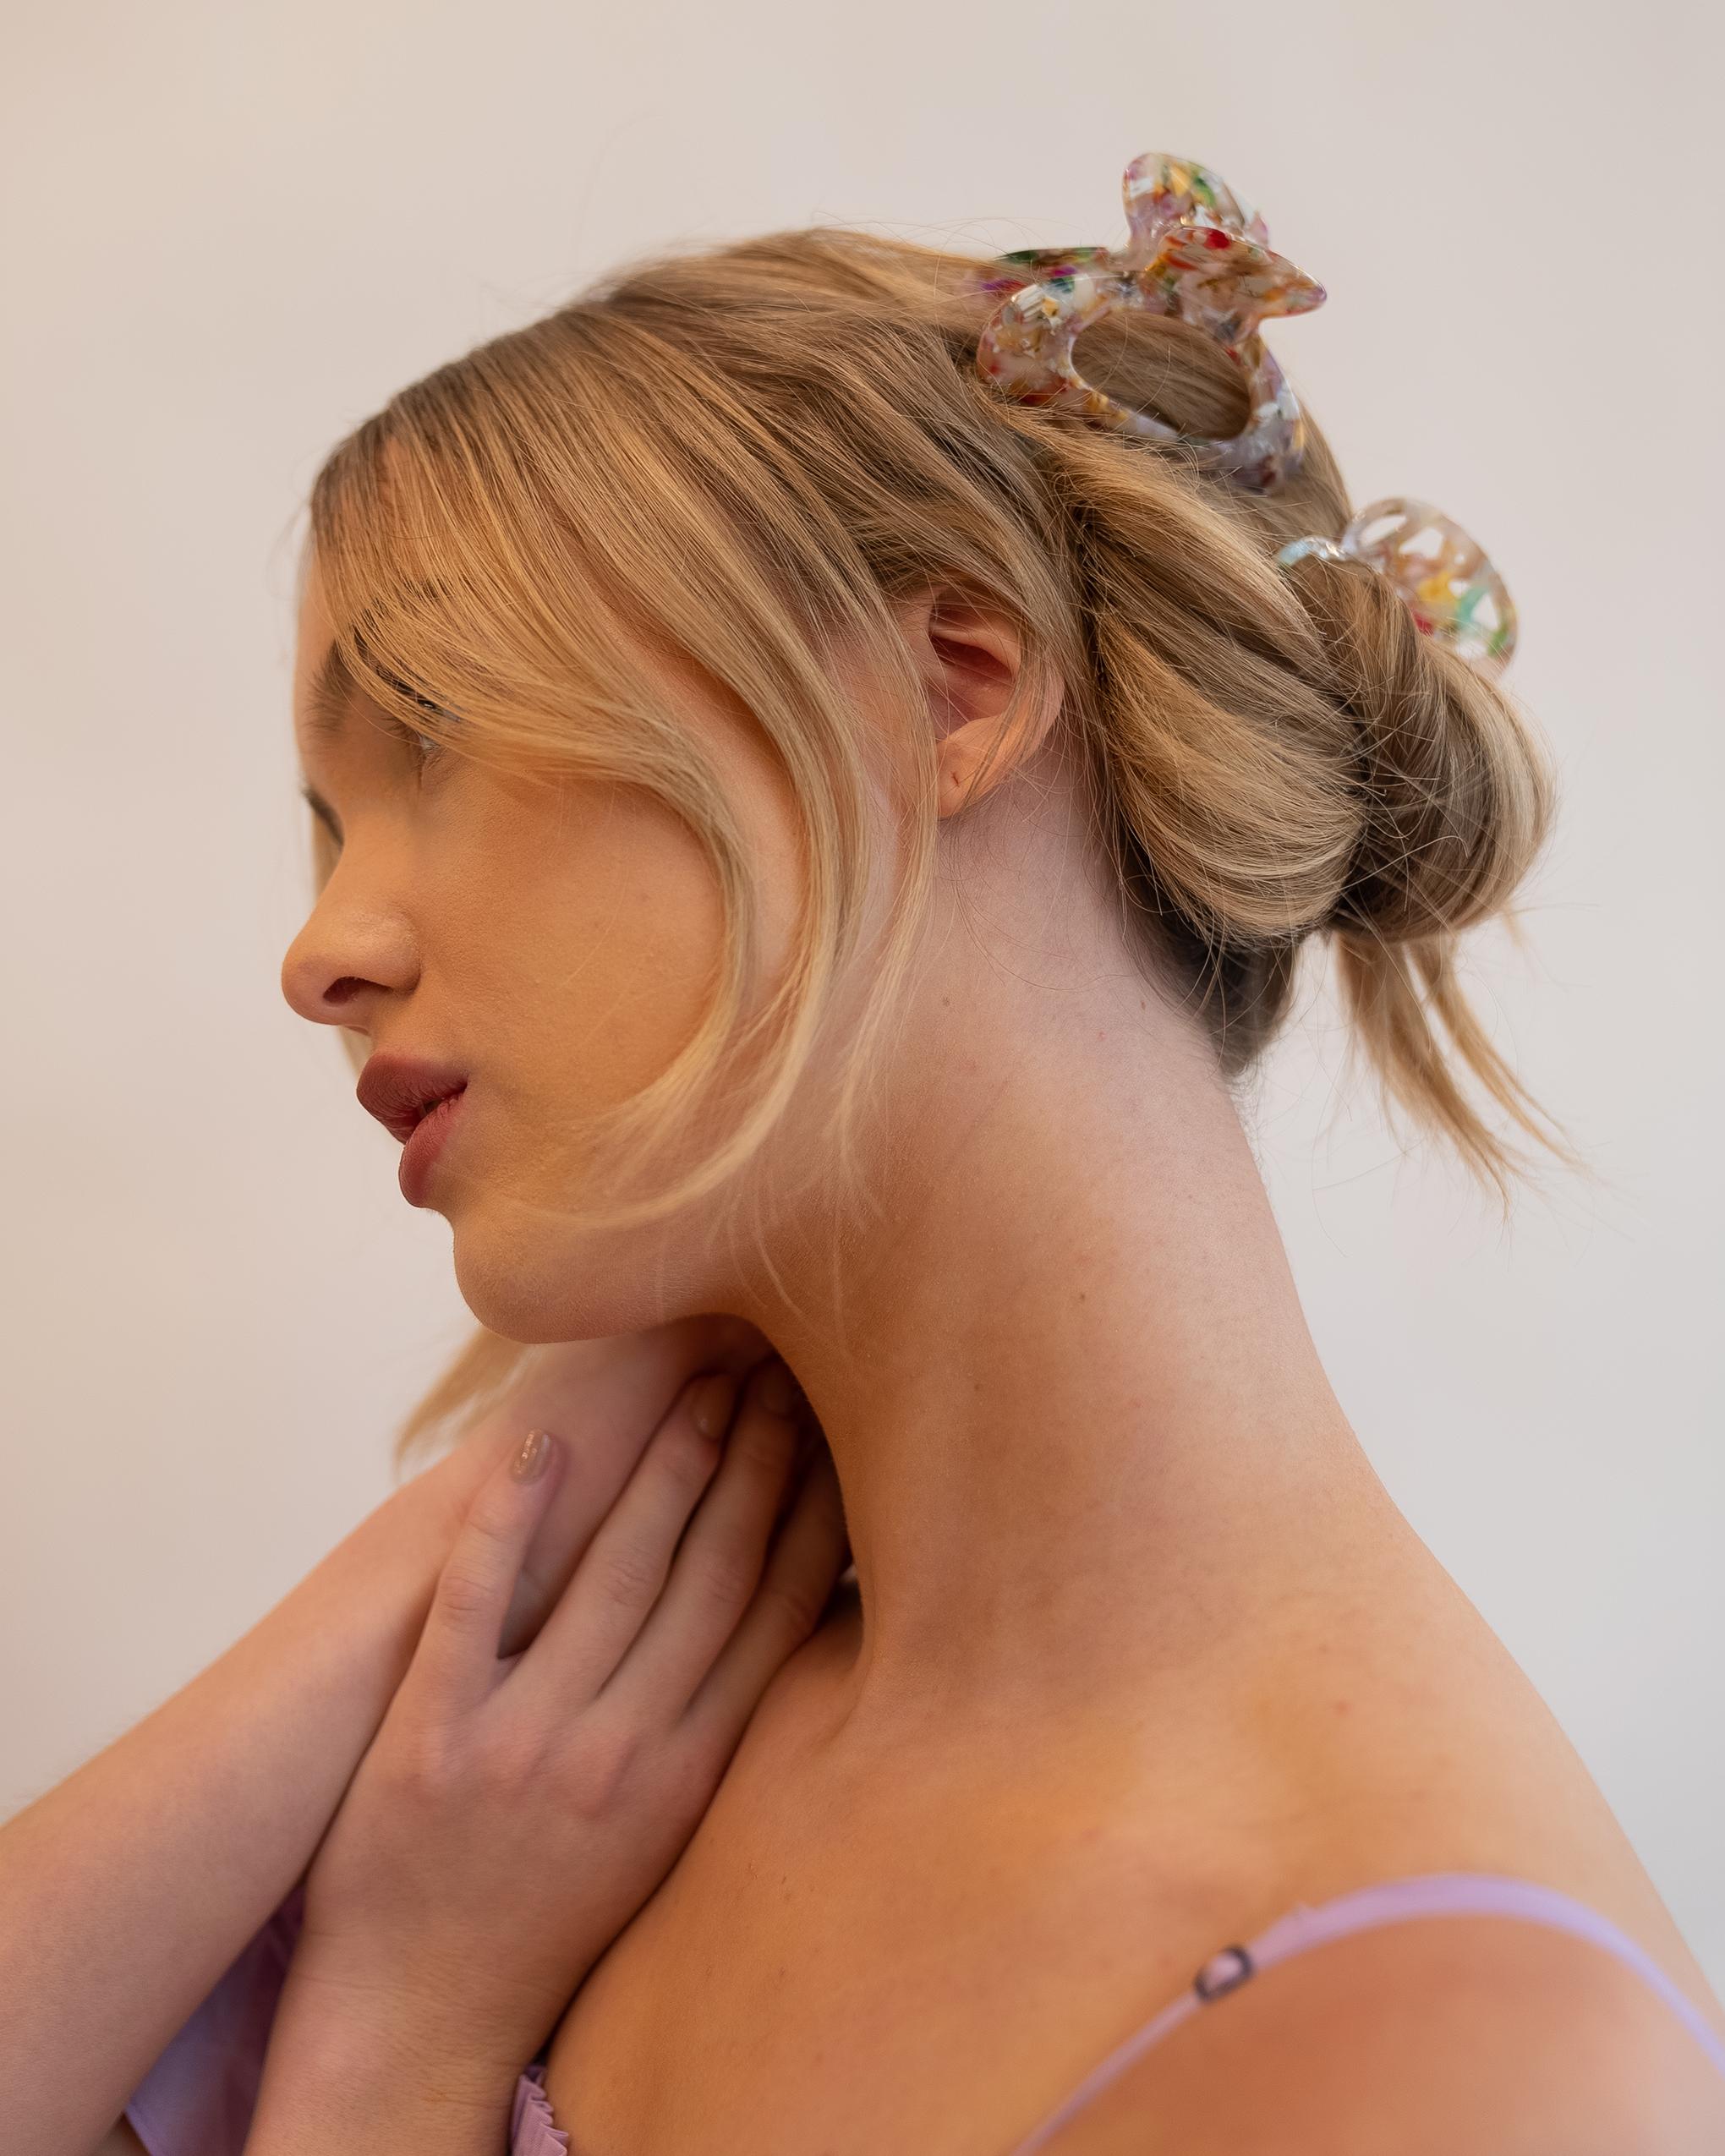 Model wearing Emin + Paul confetti cut out hair claw.